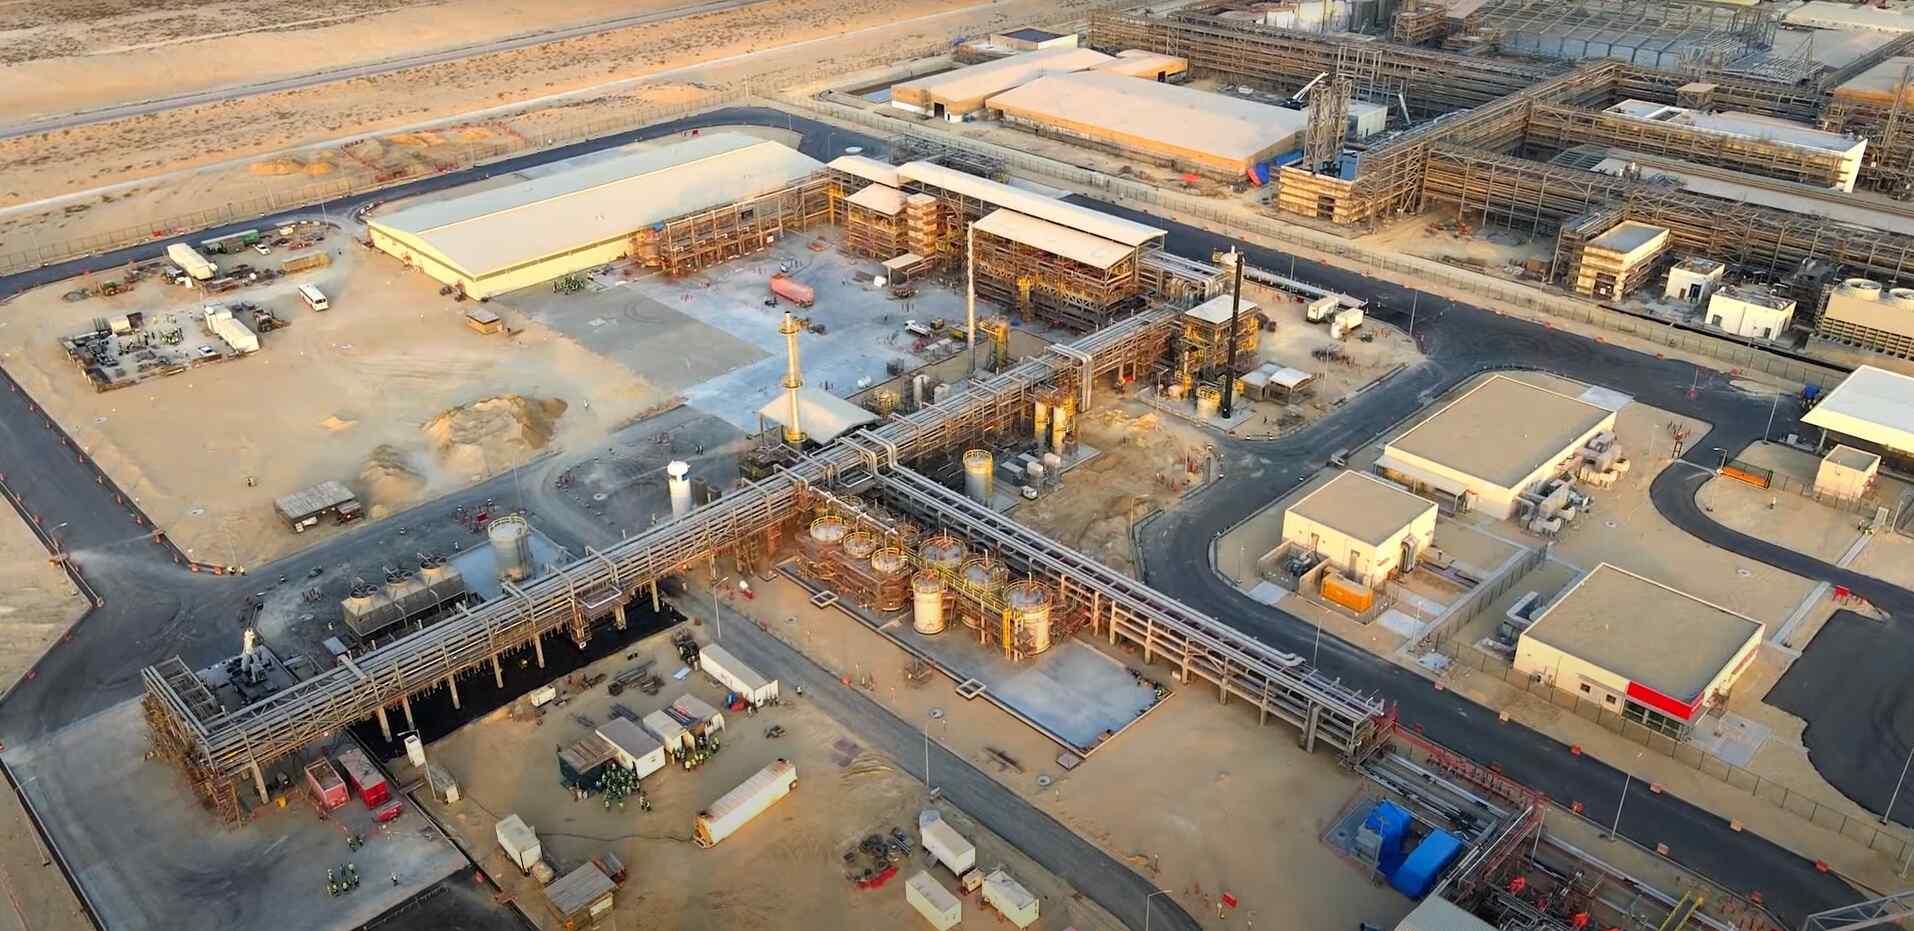 Saudi Arabia Chemical Reaction Plant